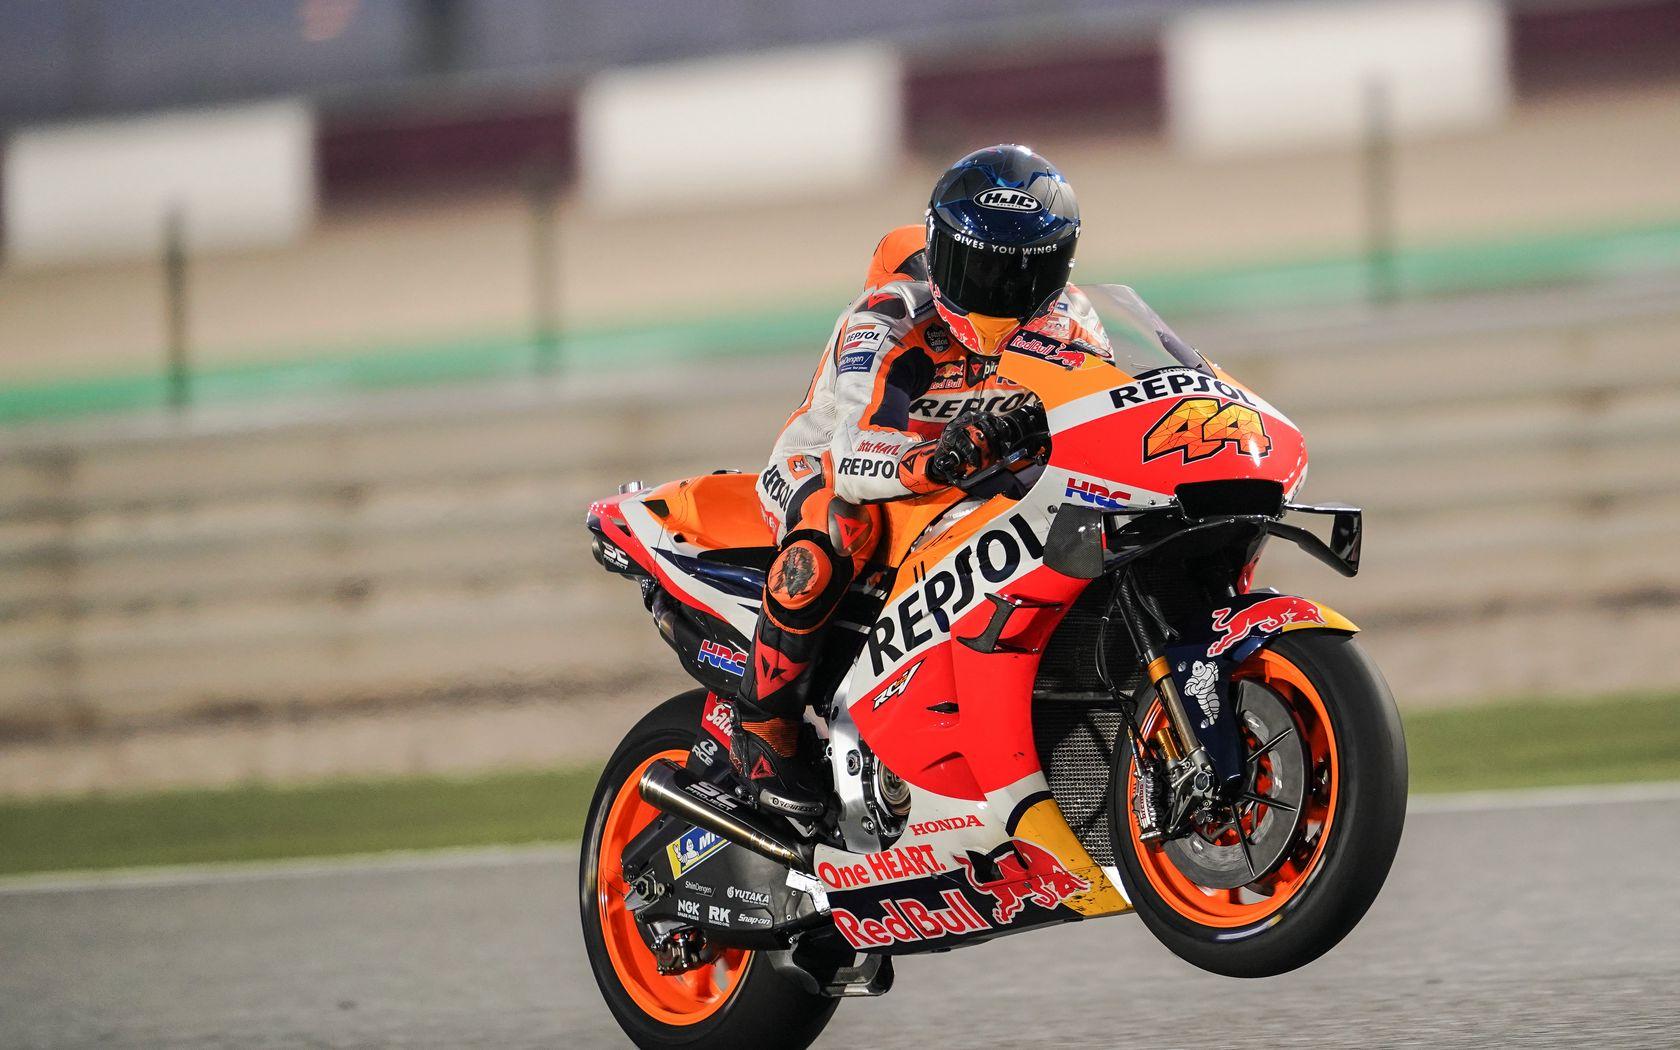 1680x1050 Wallpaper honda, motorcycle, motorcyclist, helmet, speed, track, orange